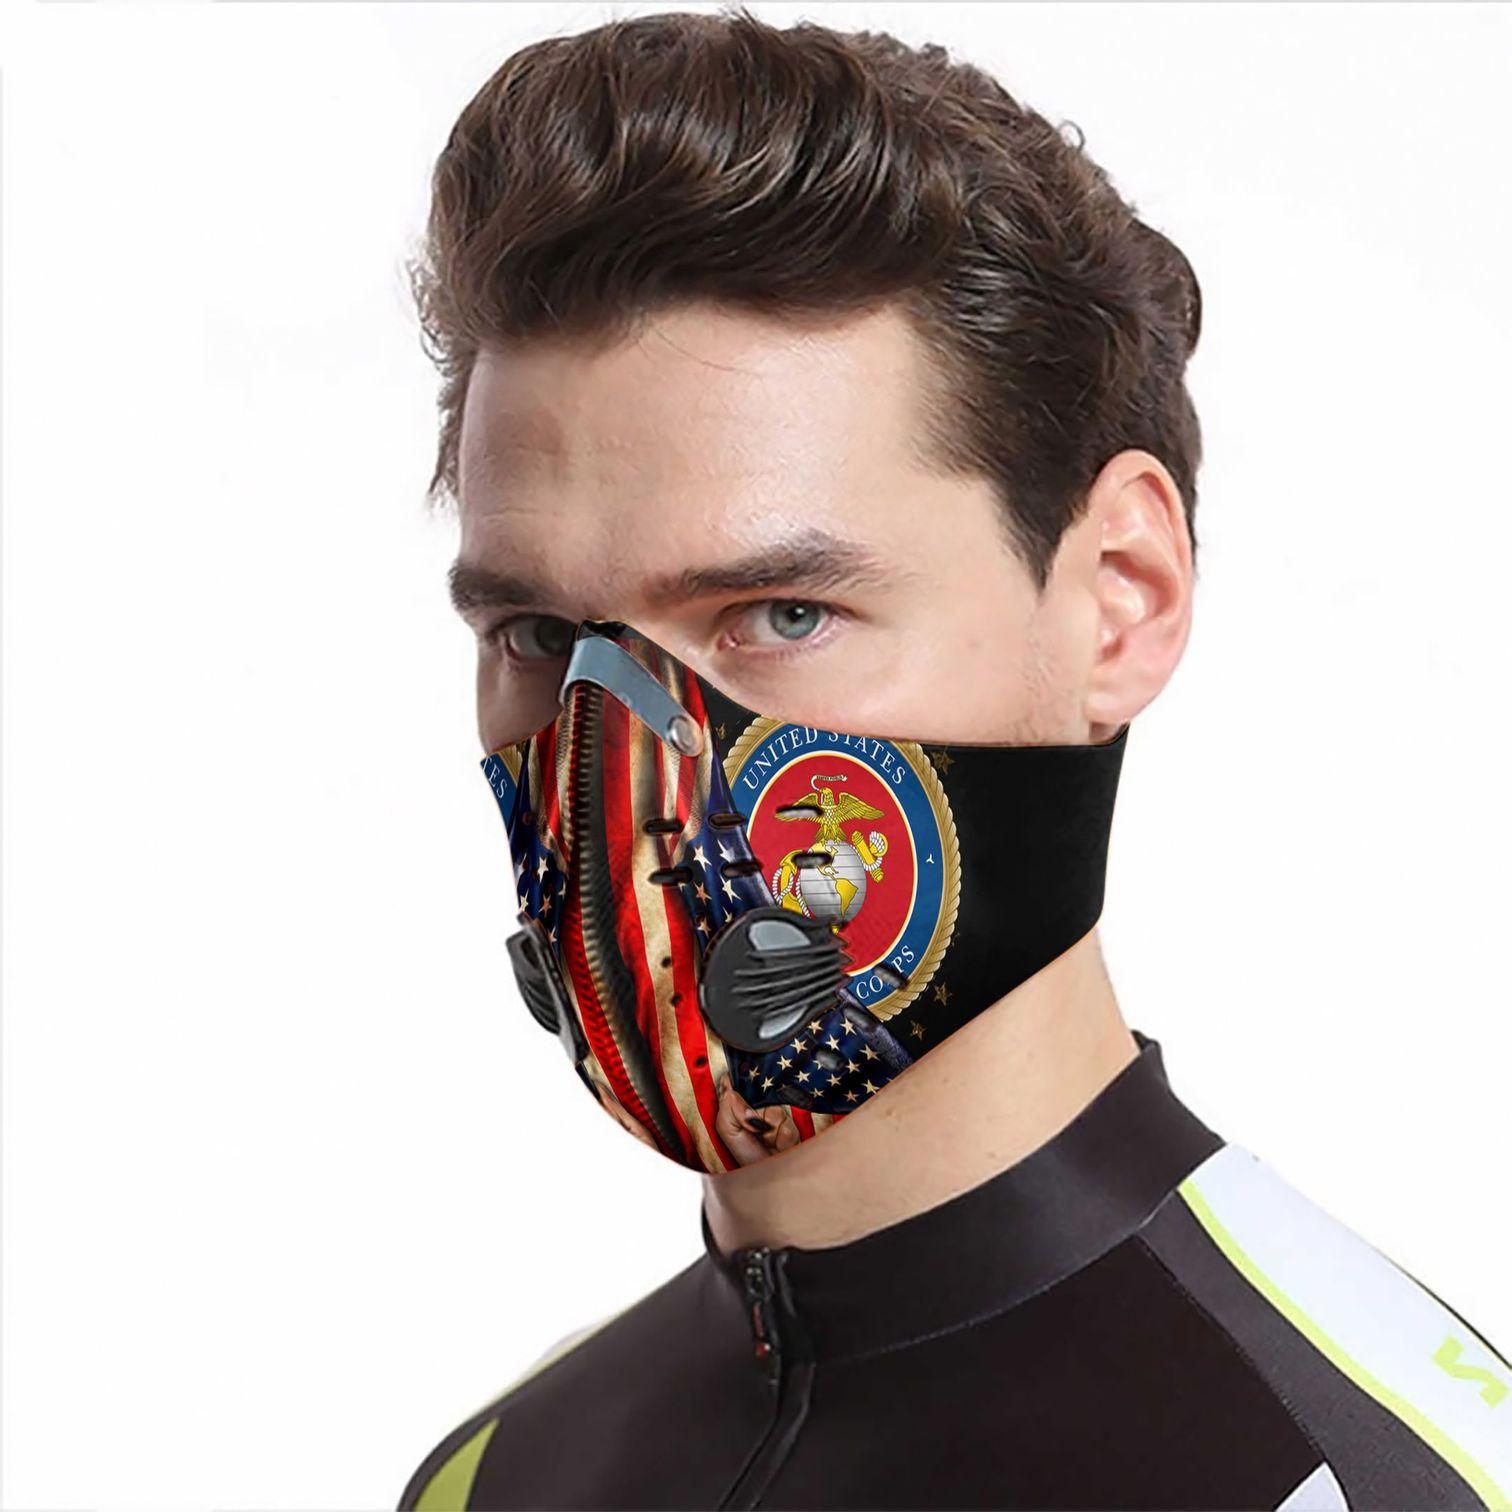 Proud marine corps carbon pm 2,5 face mask 4